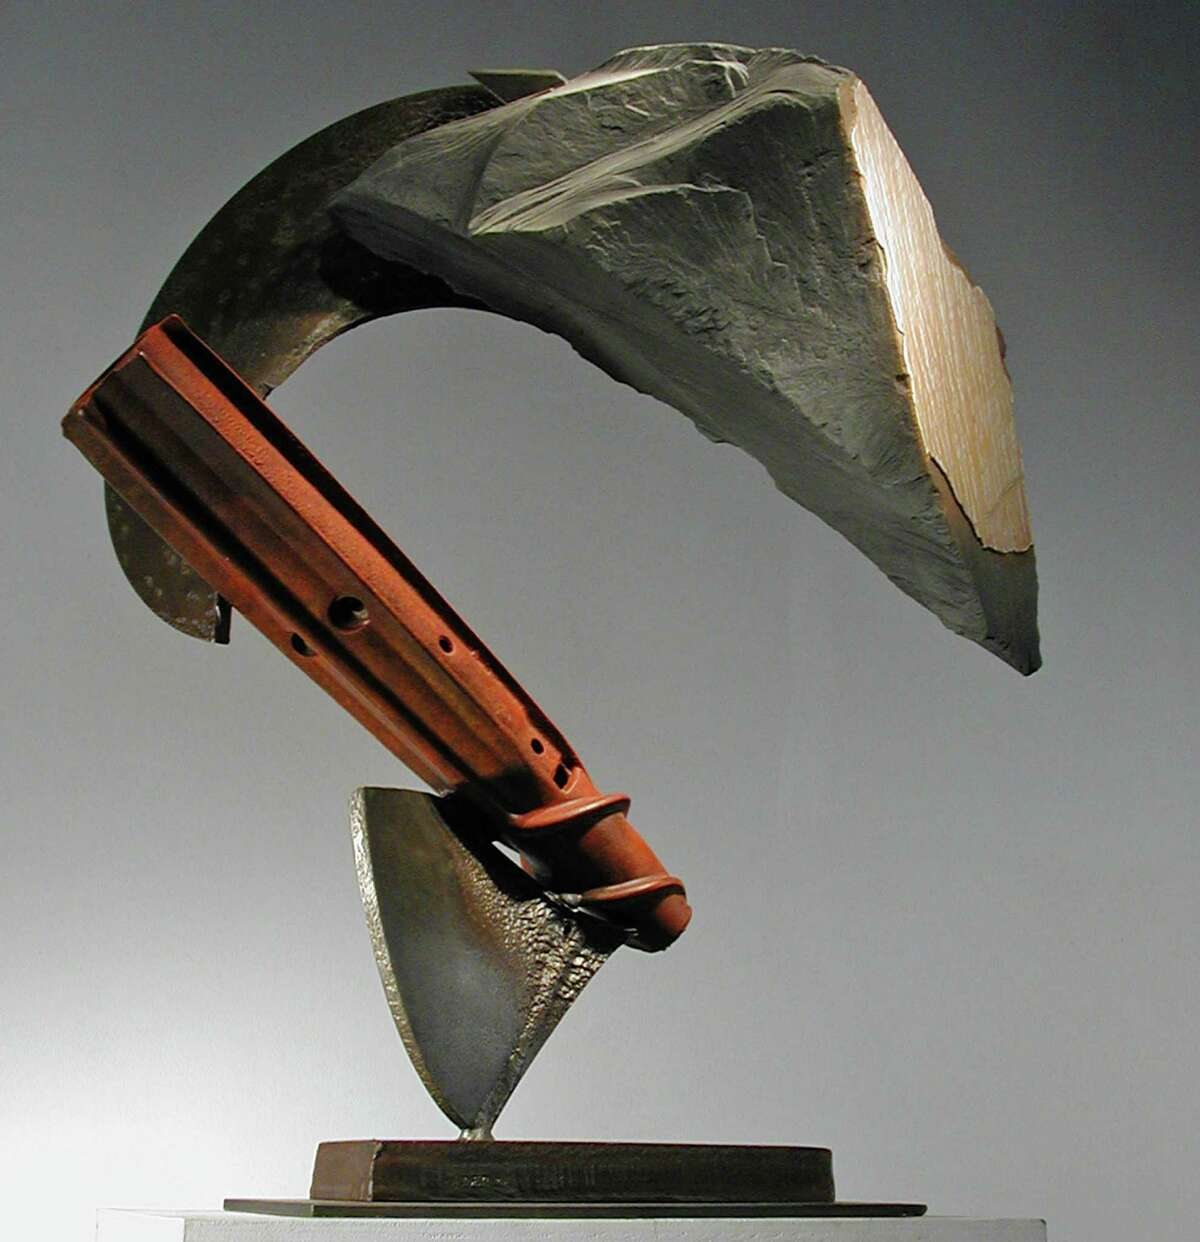 "John Van Alstine's Auger '05, 2005, slate, pigmented and sealed steel, 34"" x 28"" x 15"" (Courtesy Opalka Gallery)"